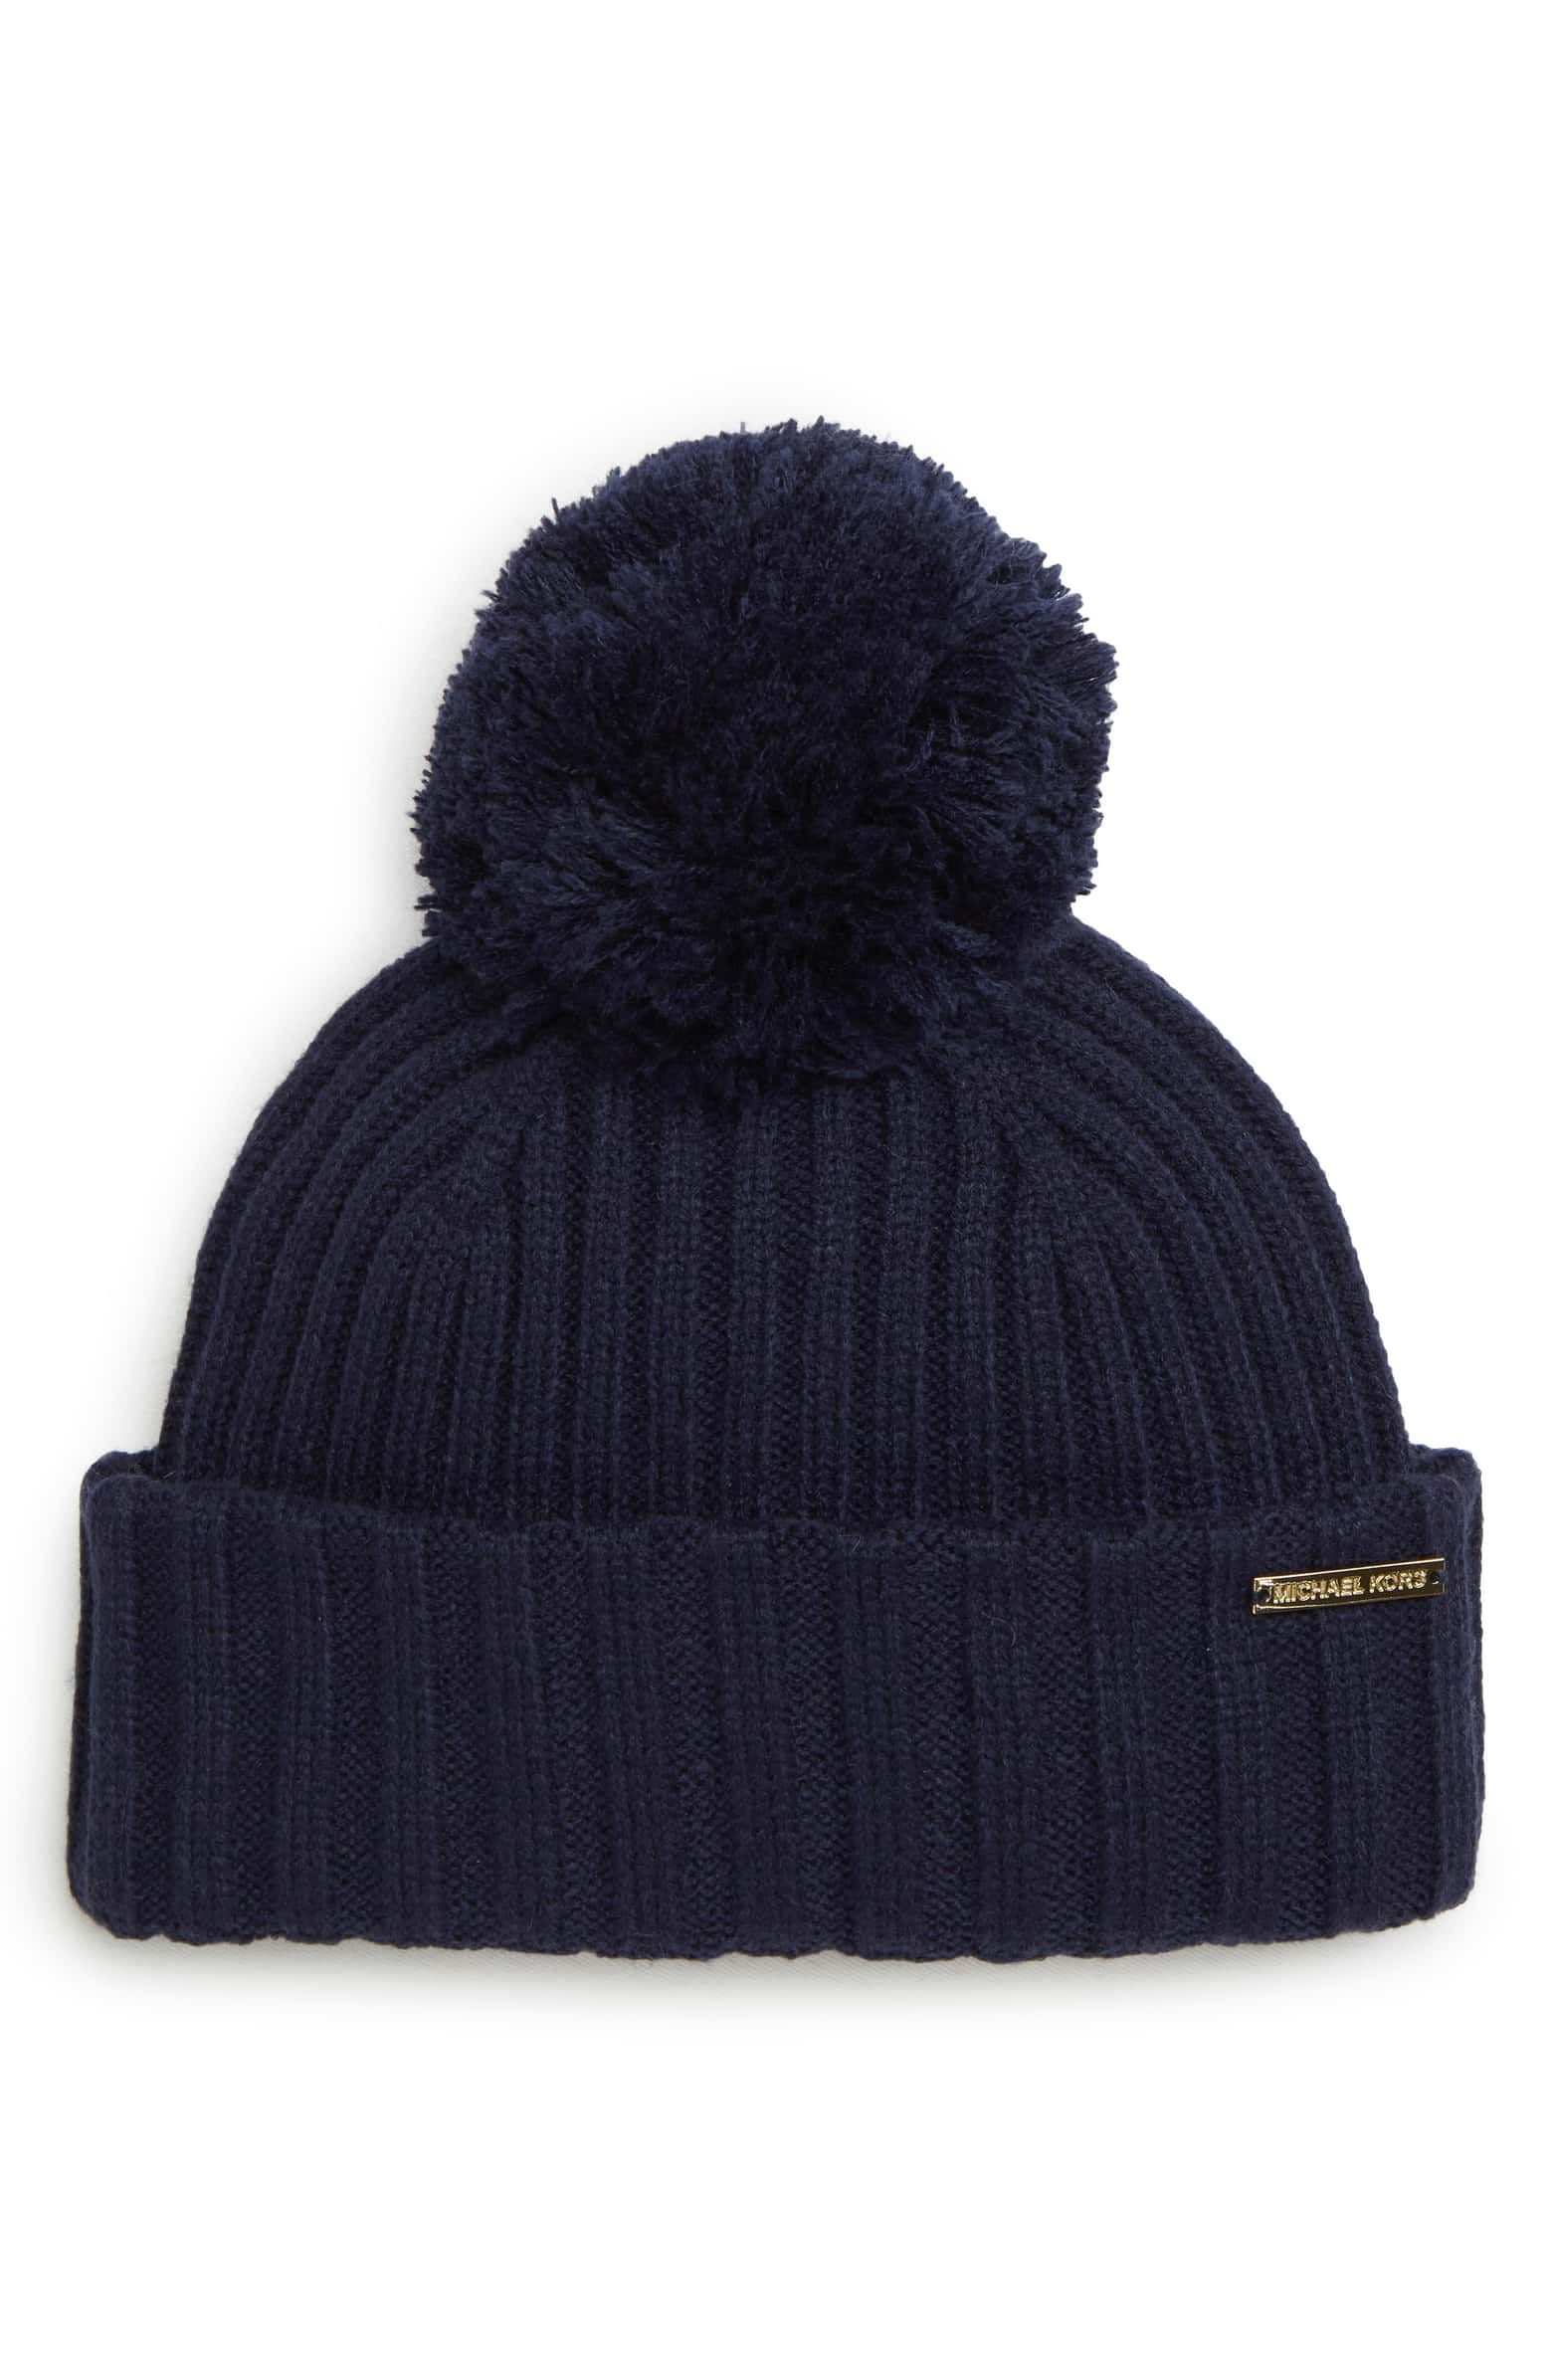 d9895de3652 Girls Next Ecru Double Pom Beanie Hat (Older) - White